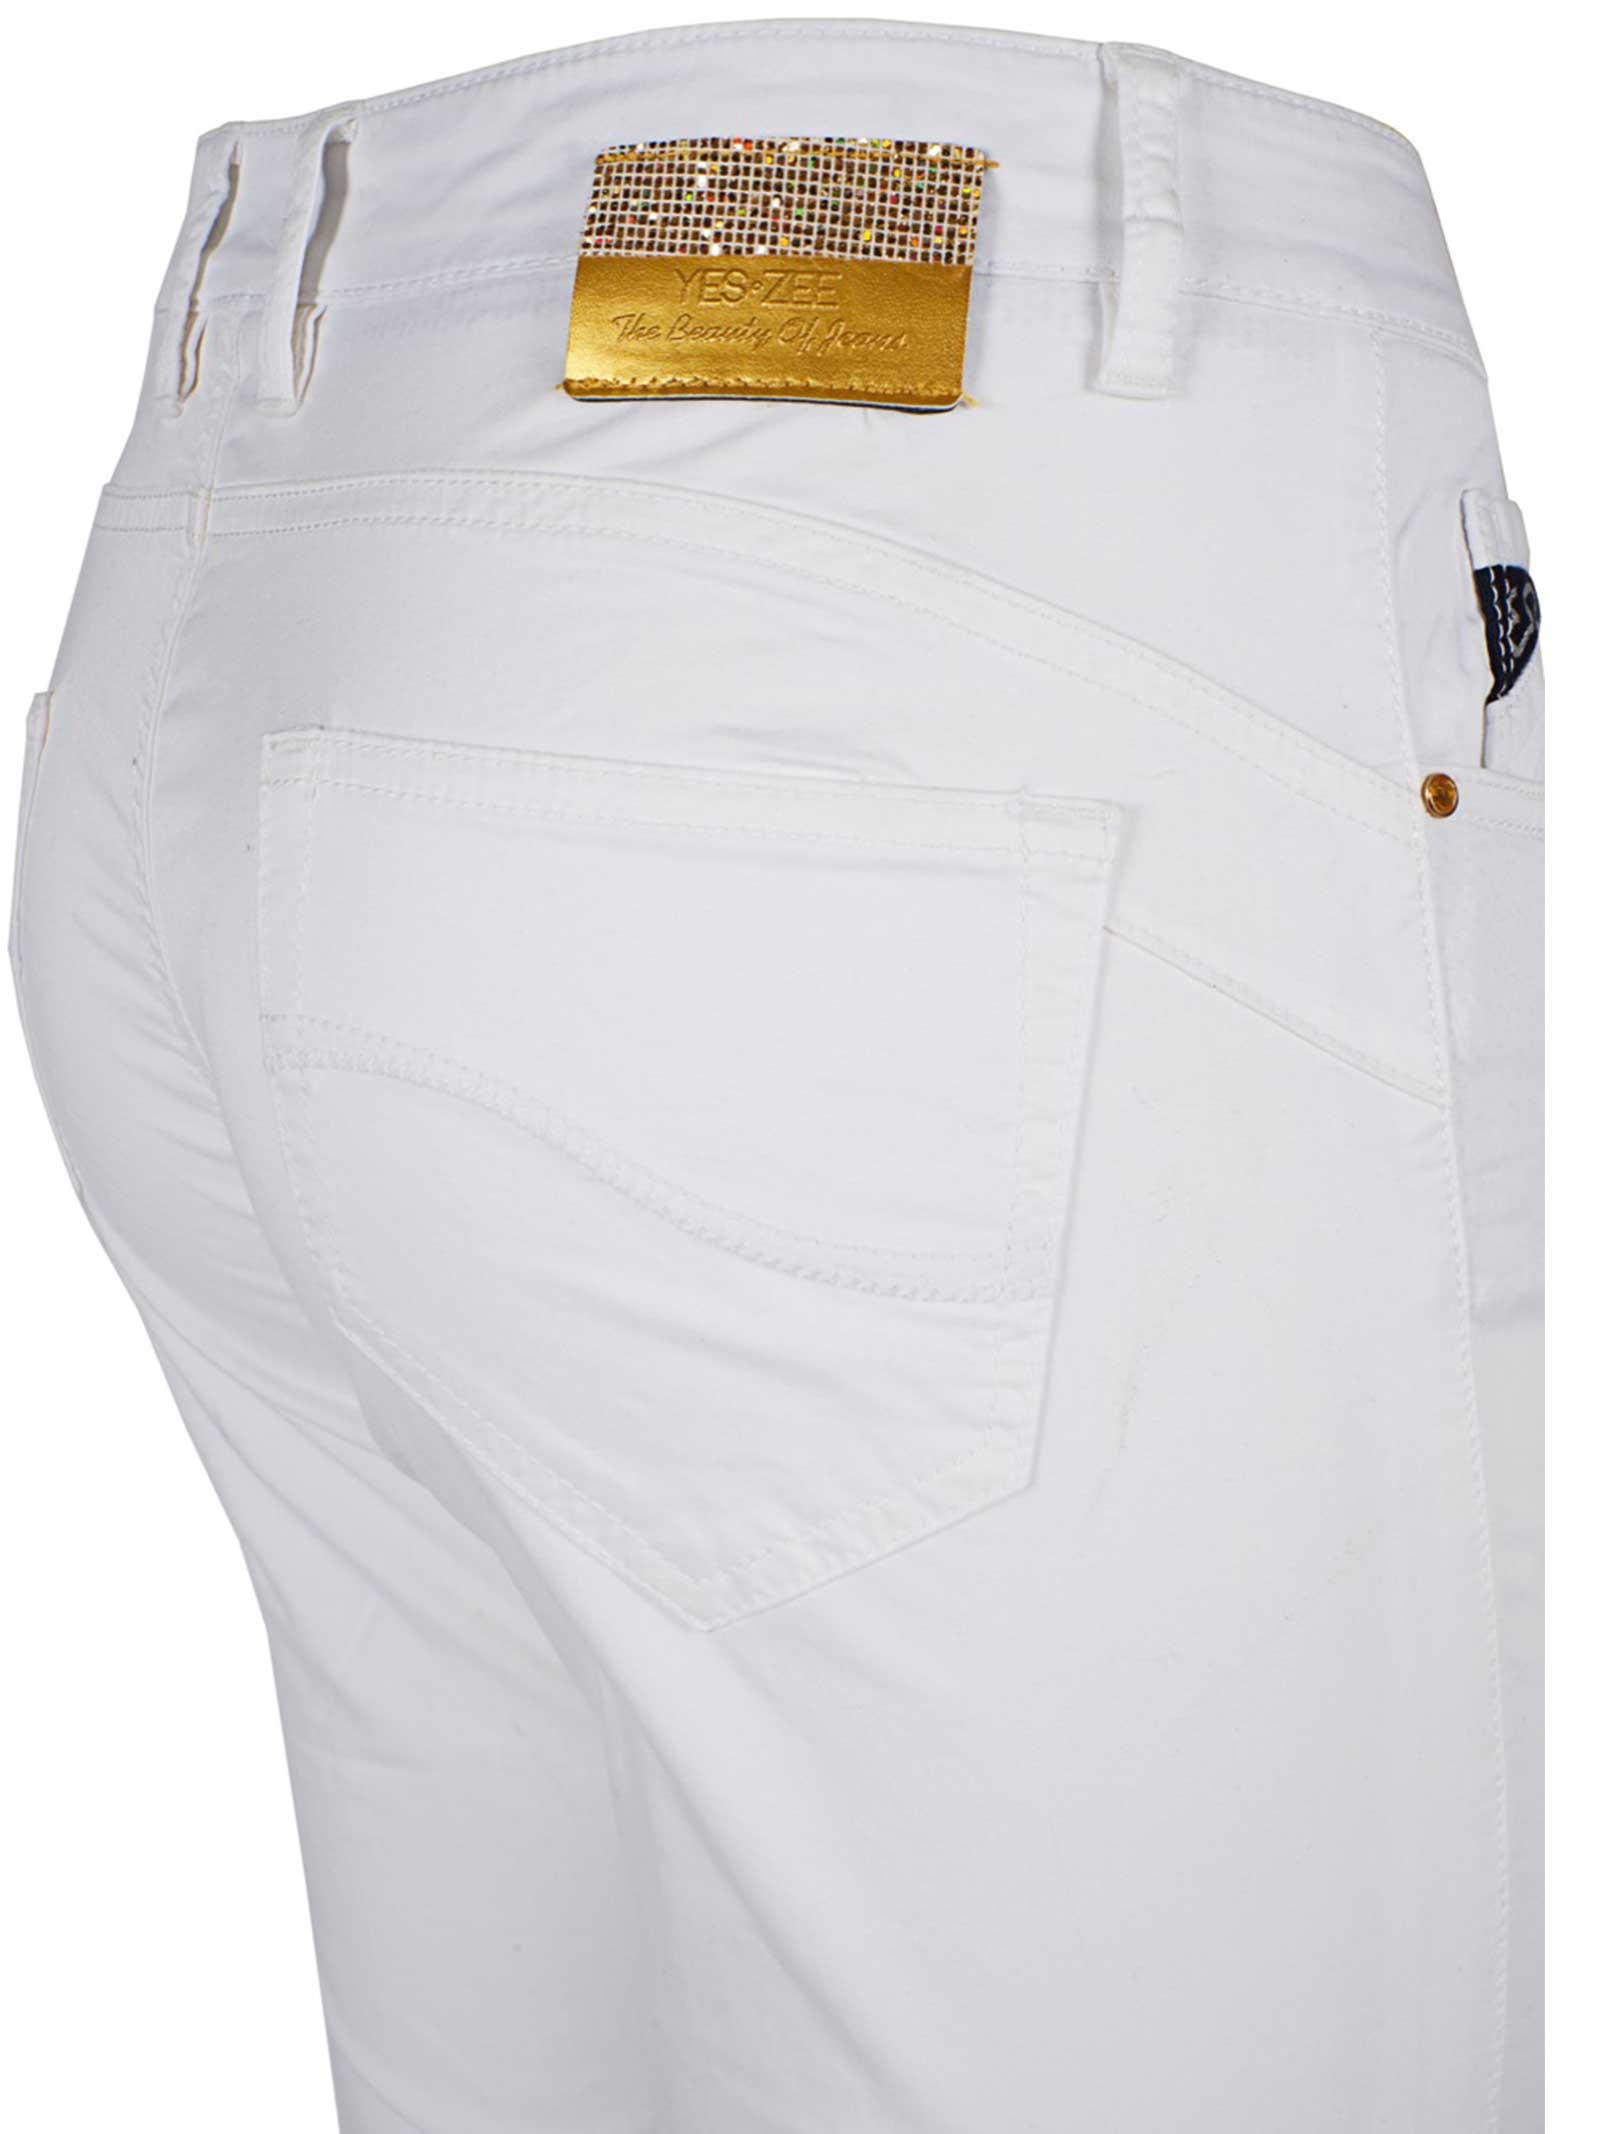 PANTALONI DONNA YES ZEE   Pantalone   P306-WB000101